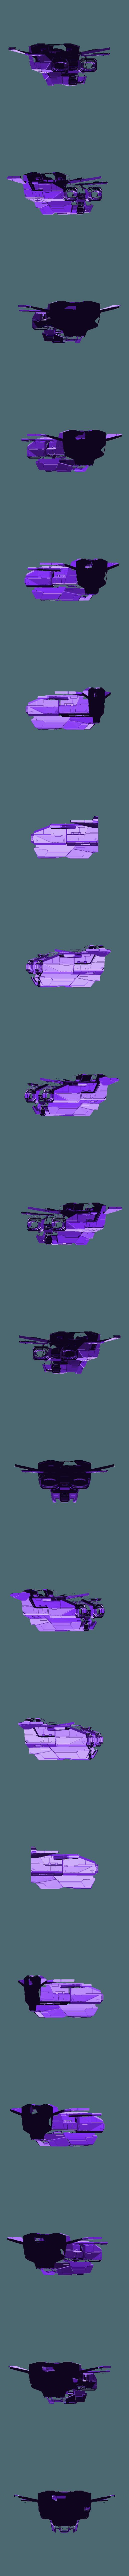 Download Free Stl File Federal Assault Ship 2 Part Elite Dangerous 3d Printable Template Cults